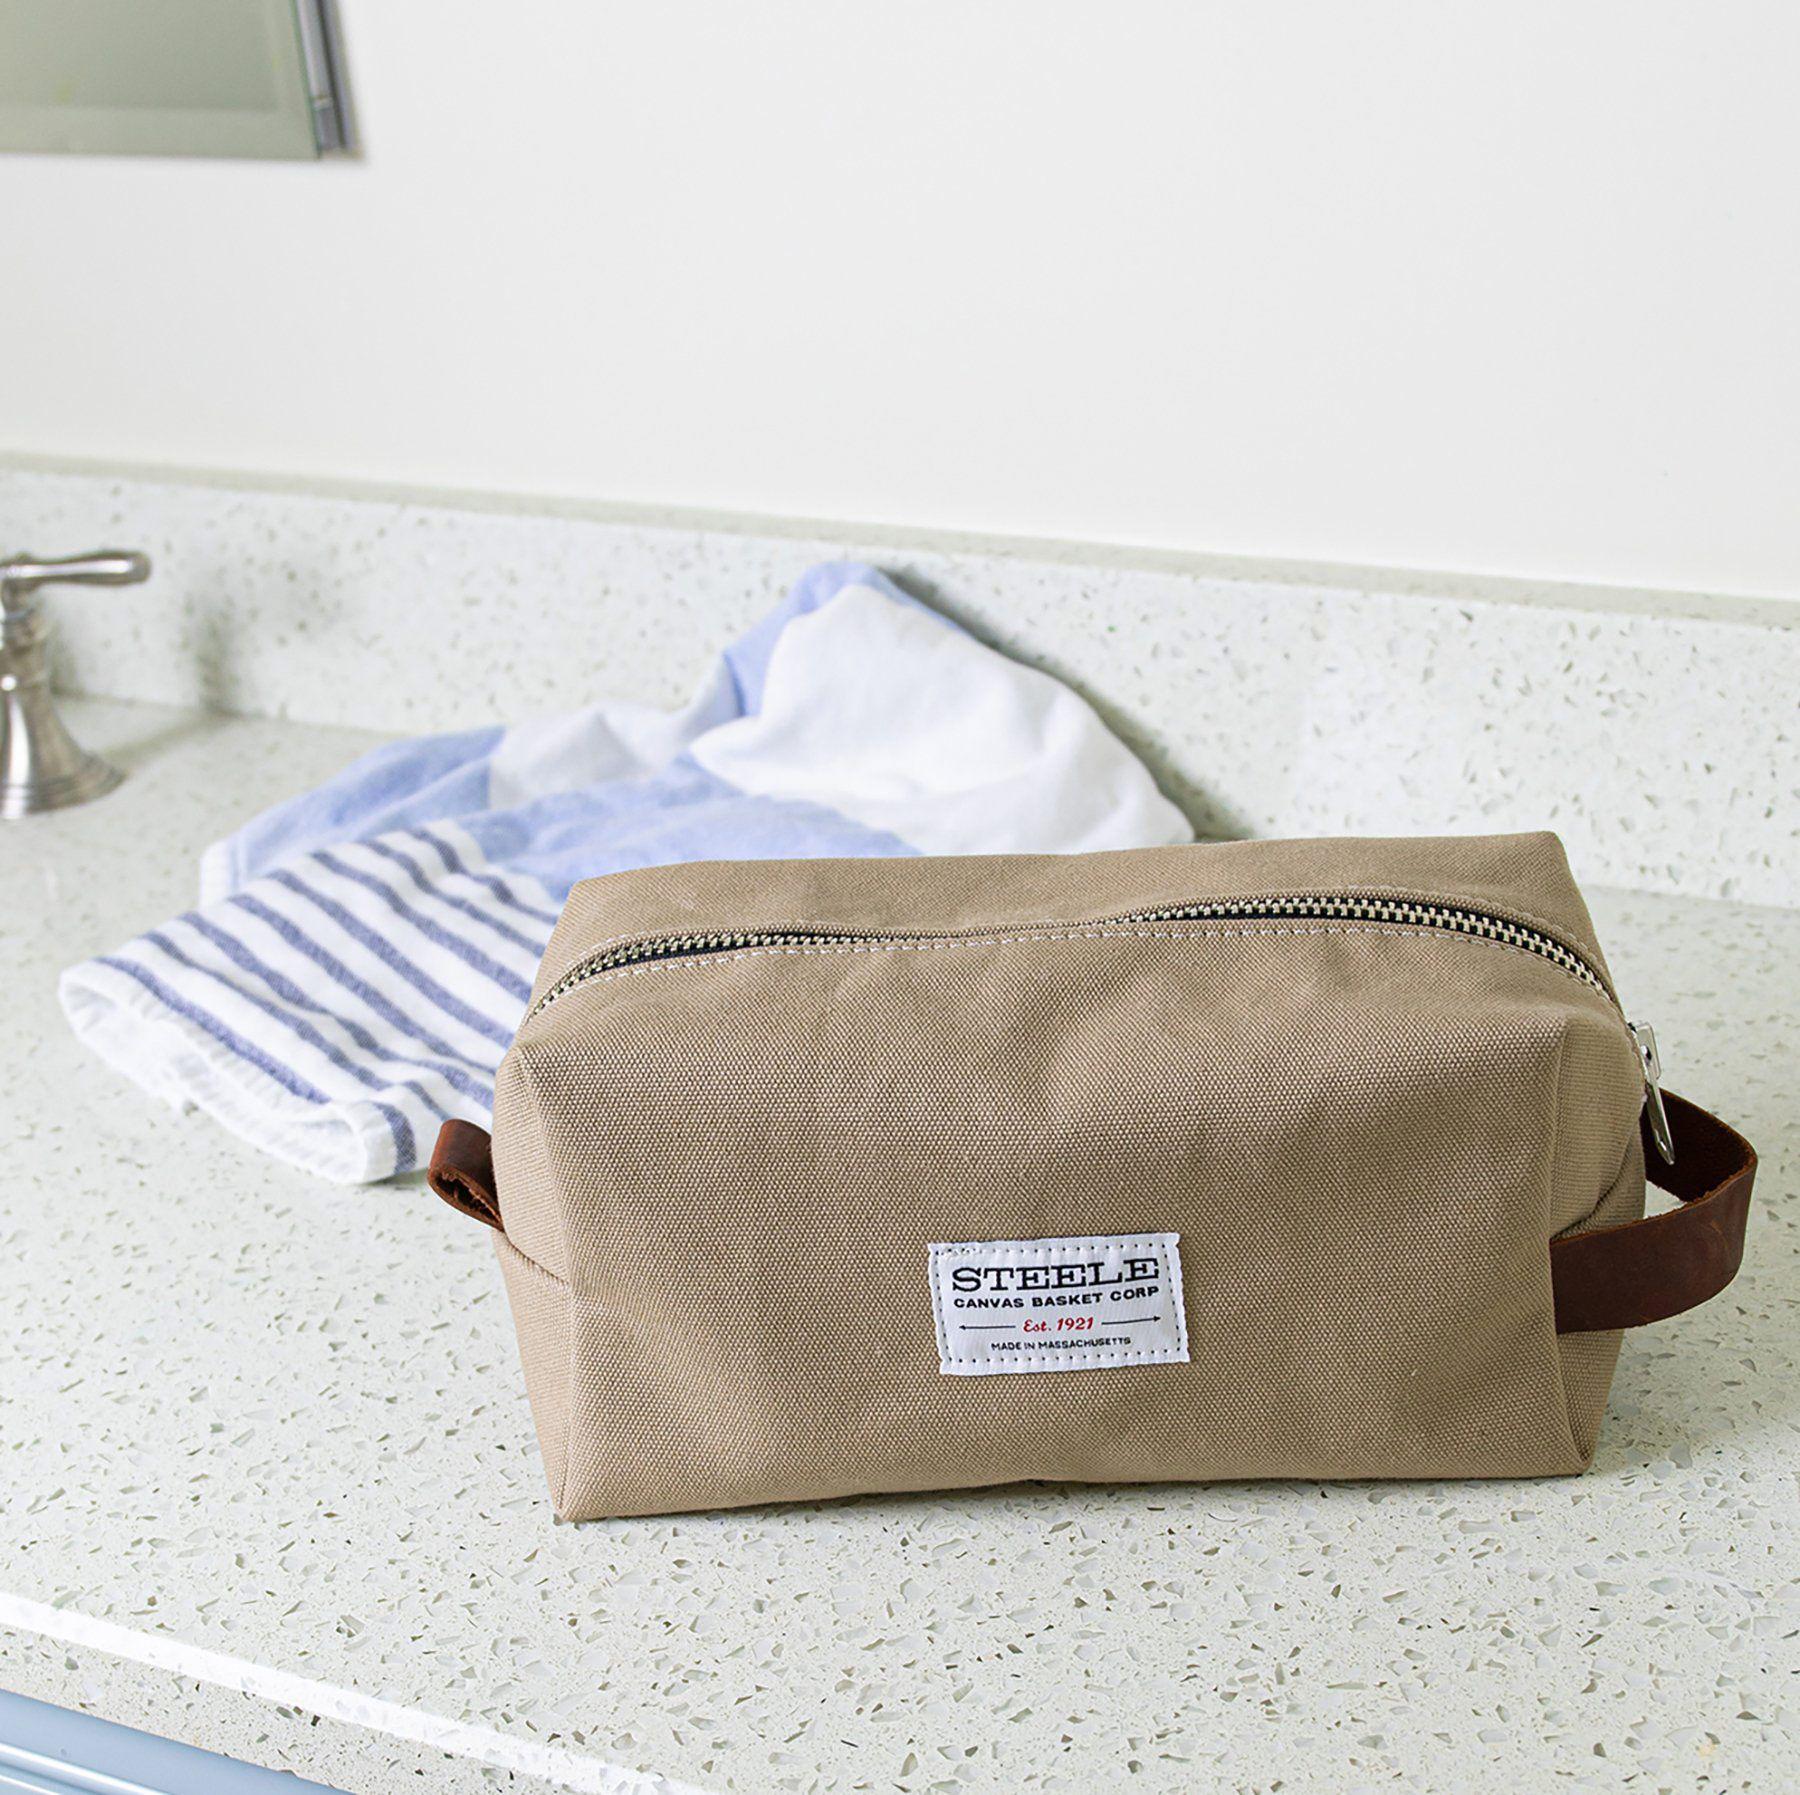 18 Best Dopp Kits And Toiletry Bags For Men 2020 The Strategist New York Magazine